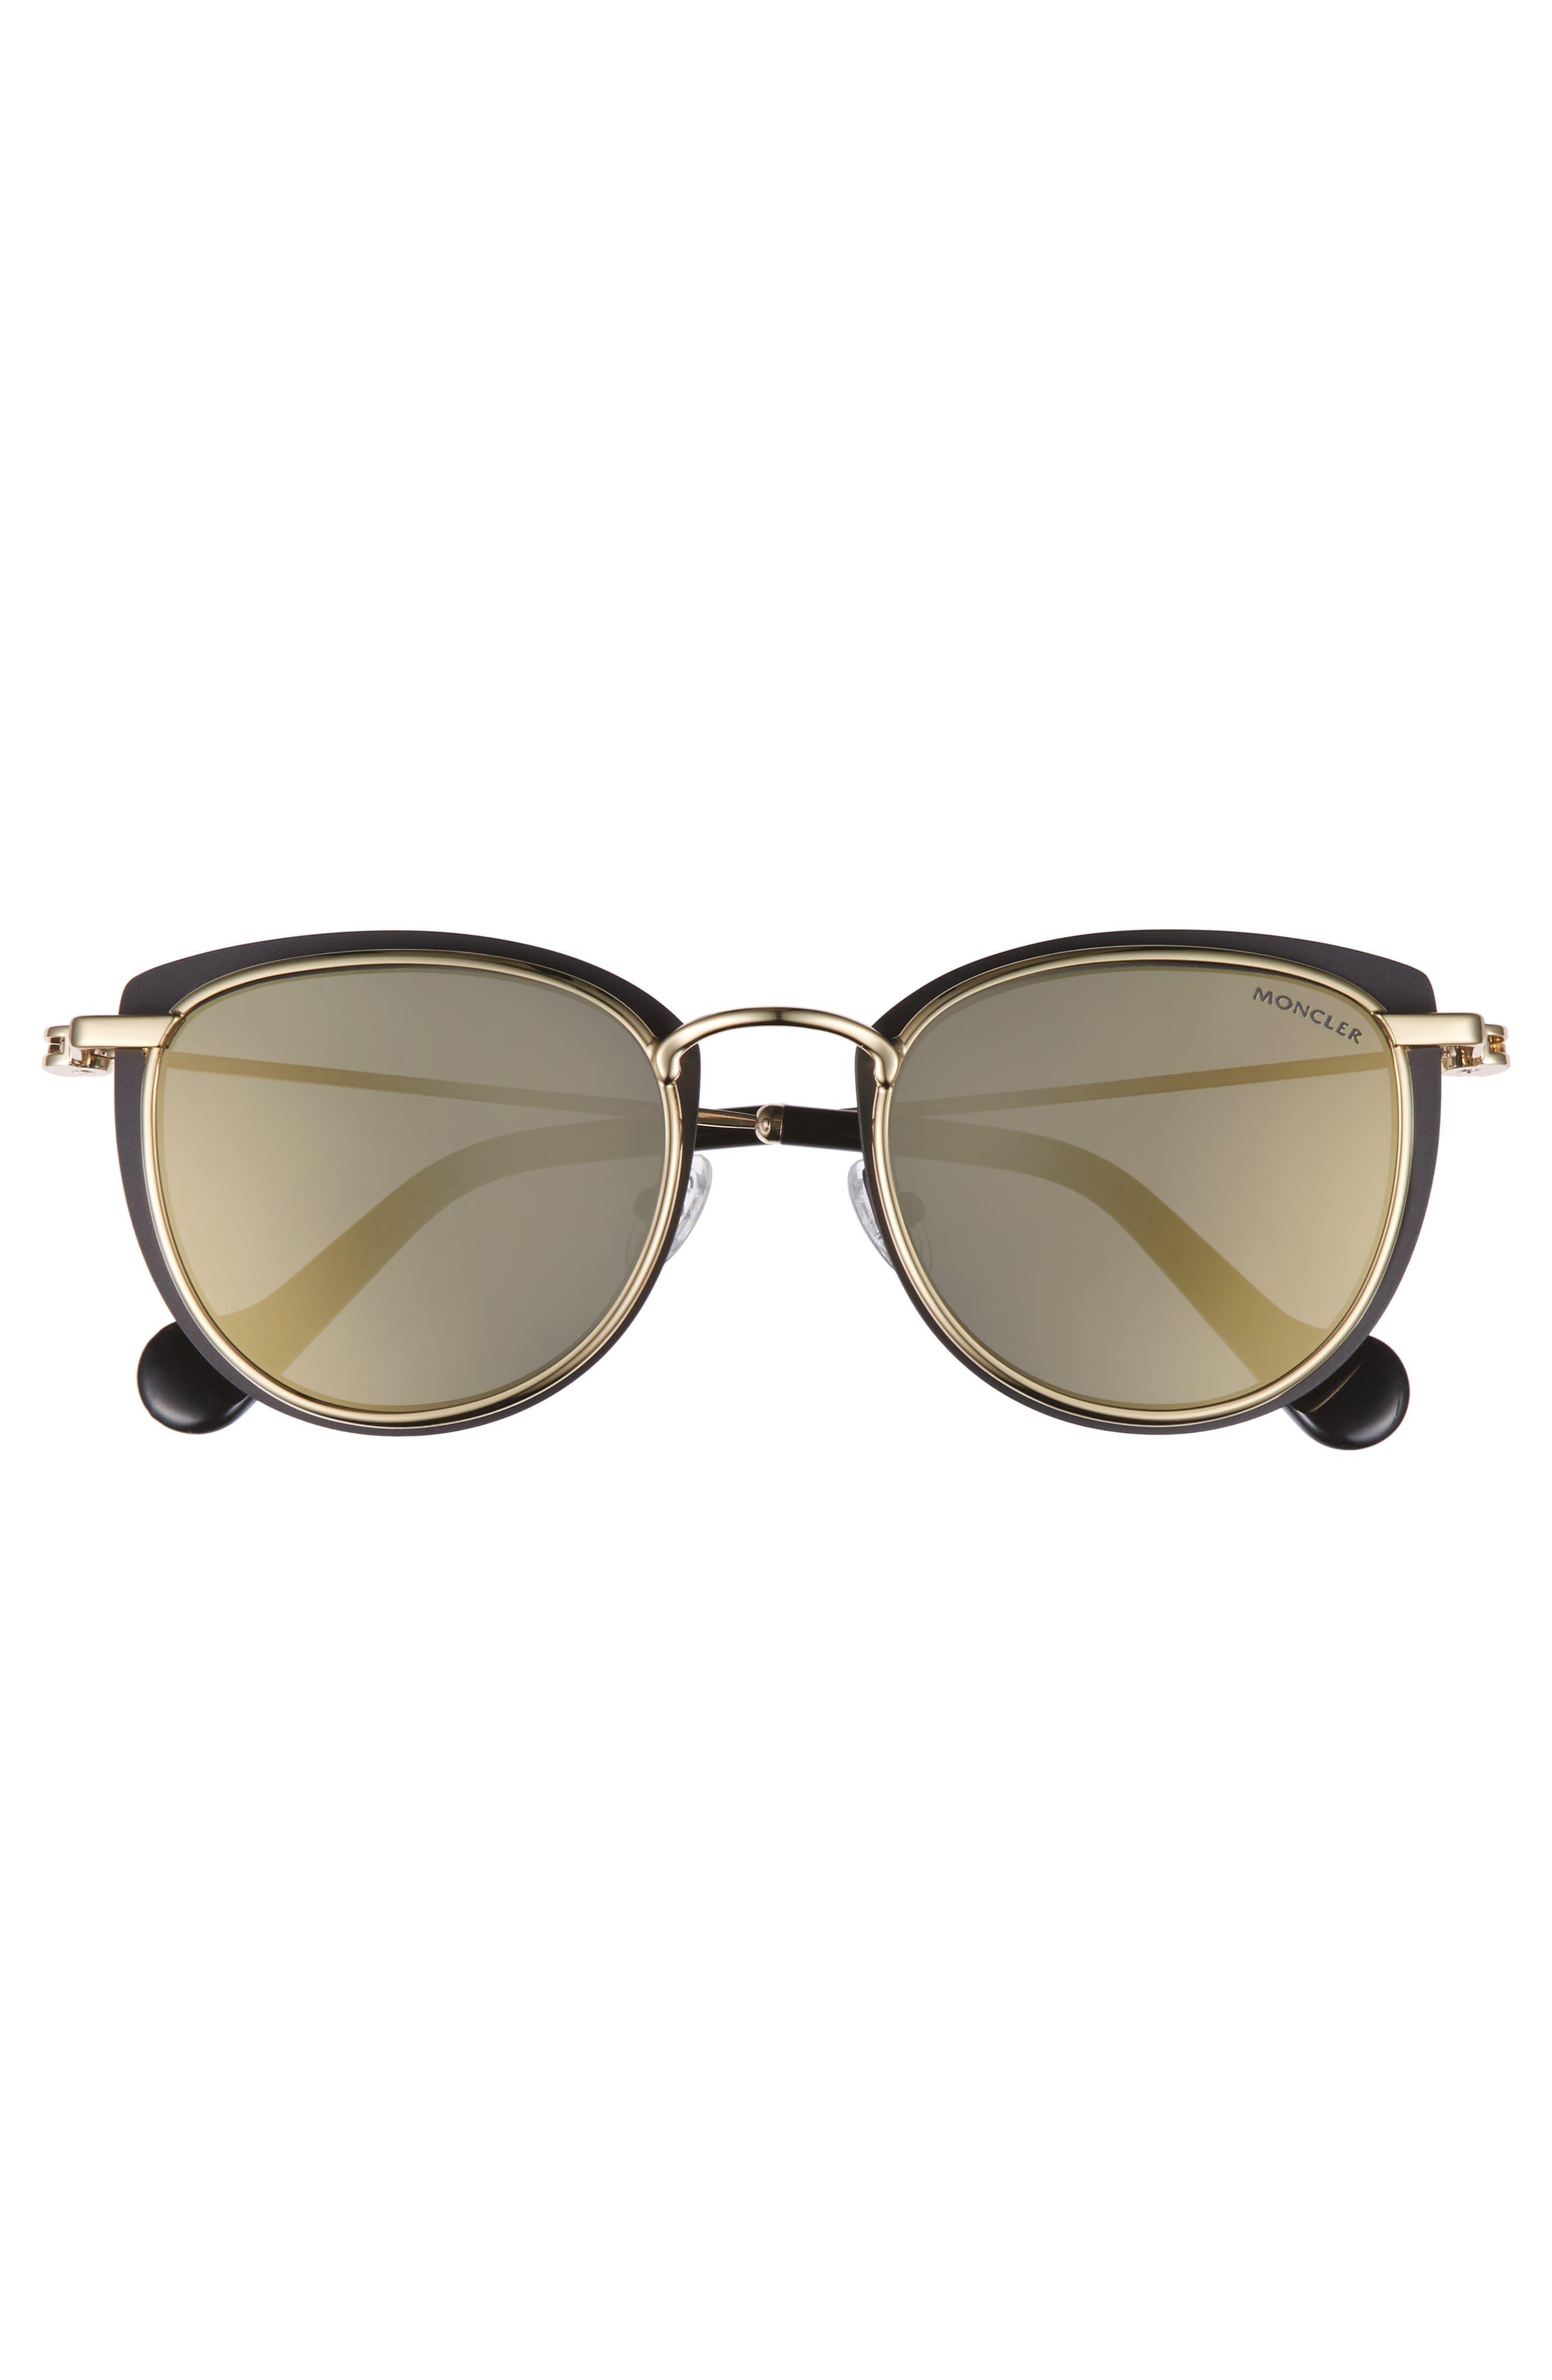 50mm Mirrored Geometric Sunglasses,                             Alternate thumbnail 3, color,                             Black/ Pale Gold/ Smoke/ Gold